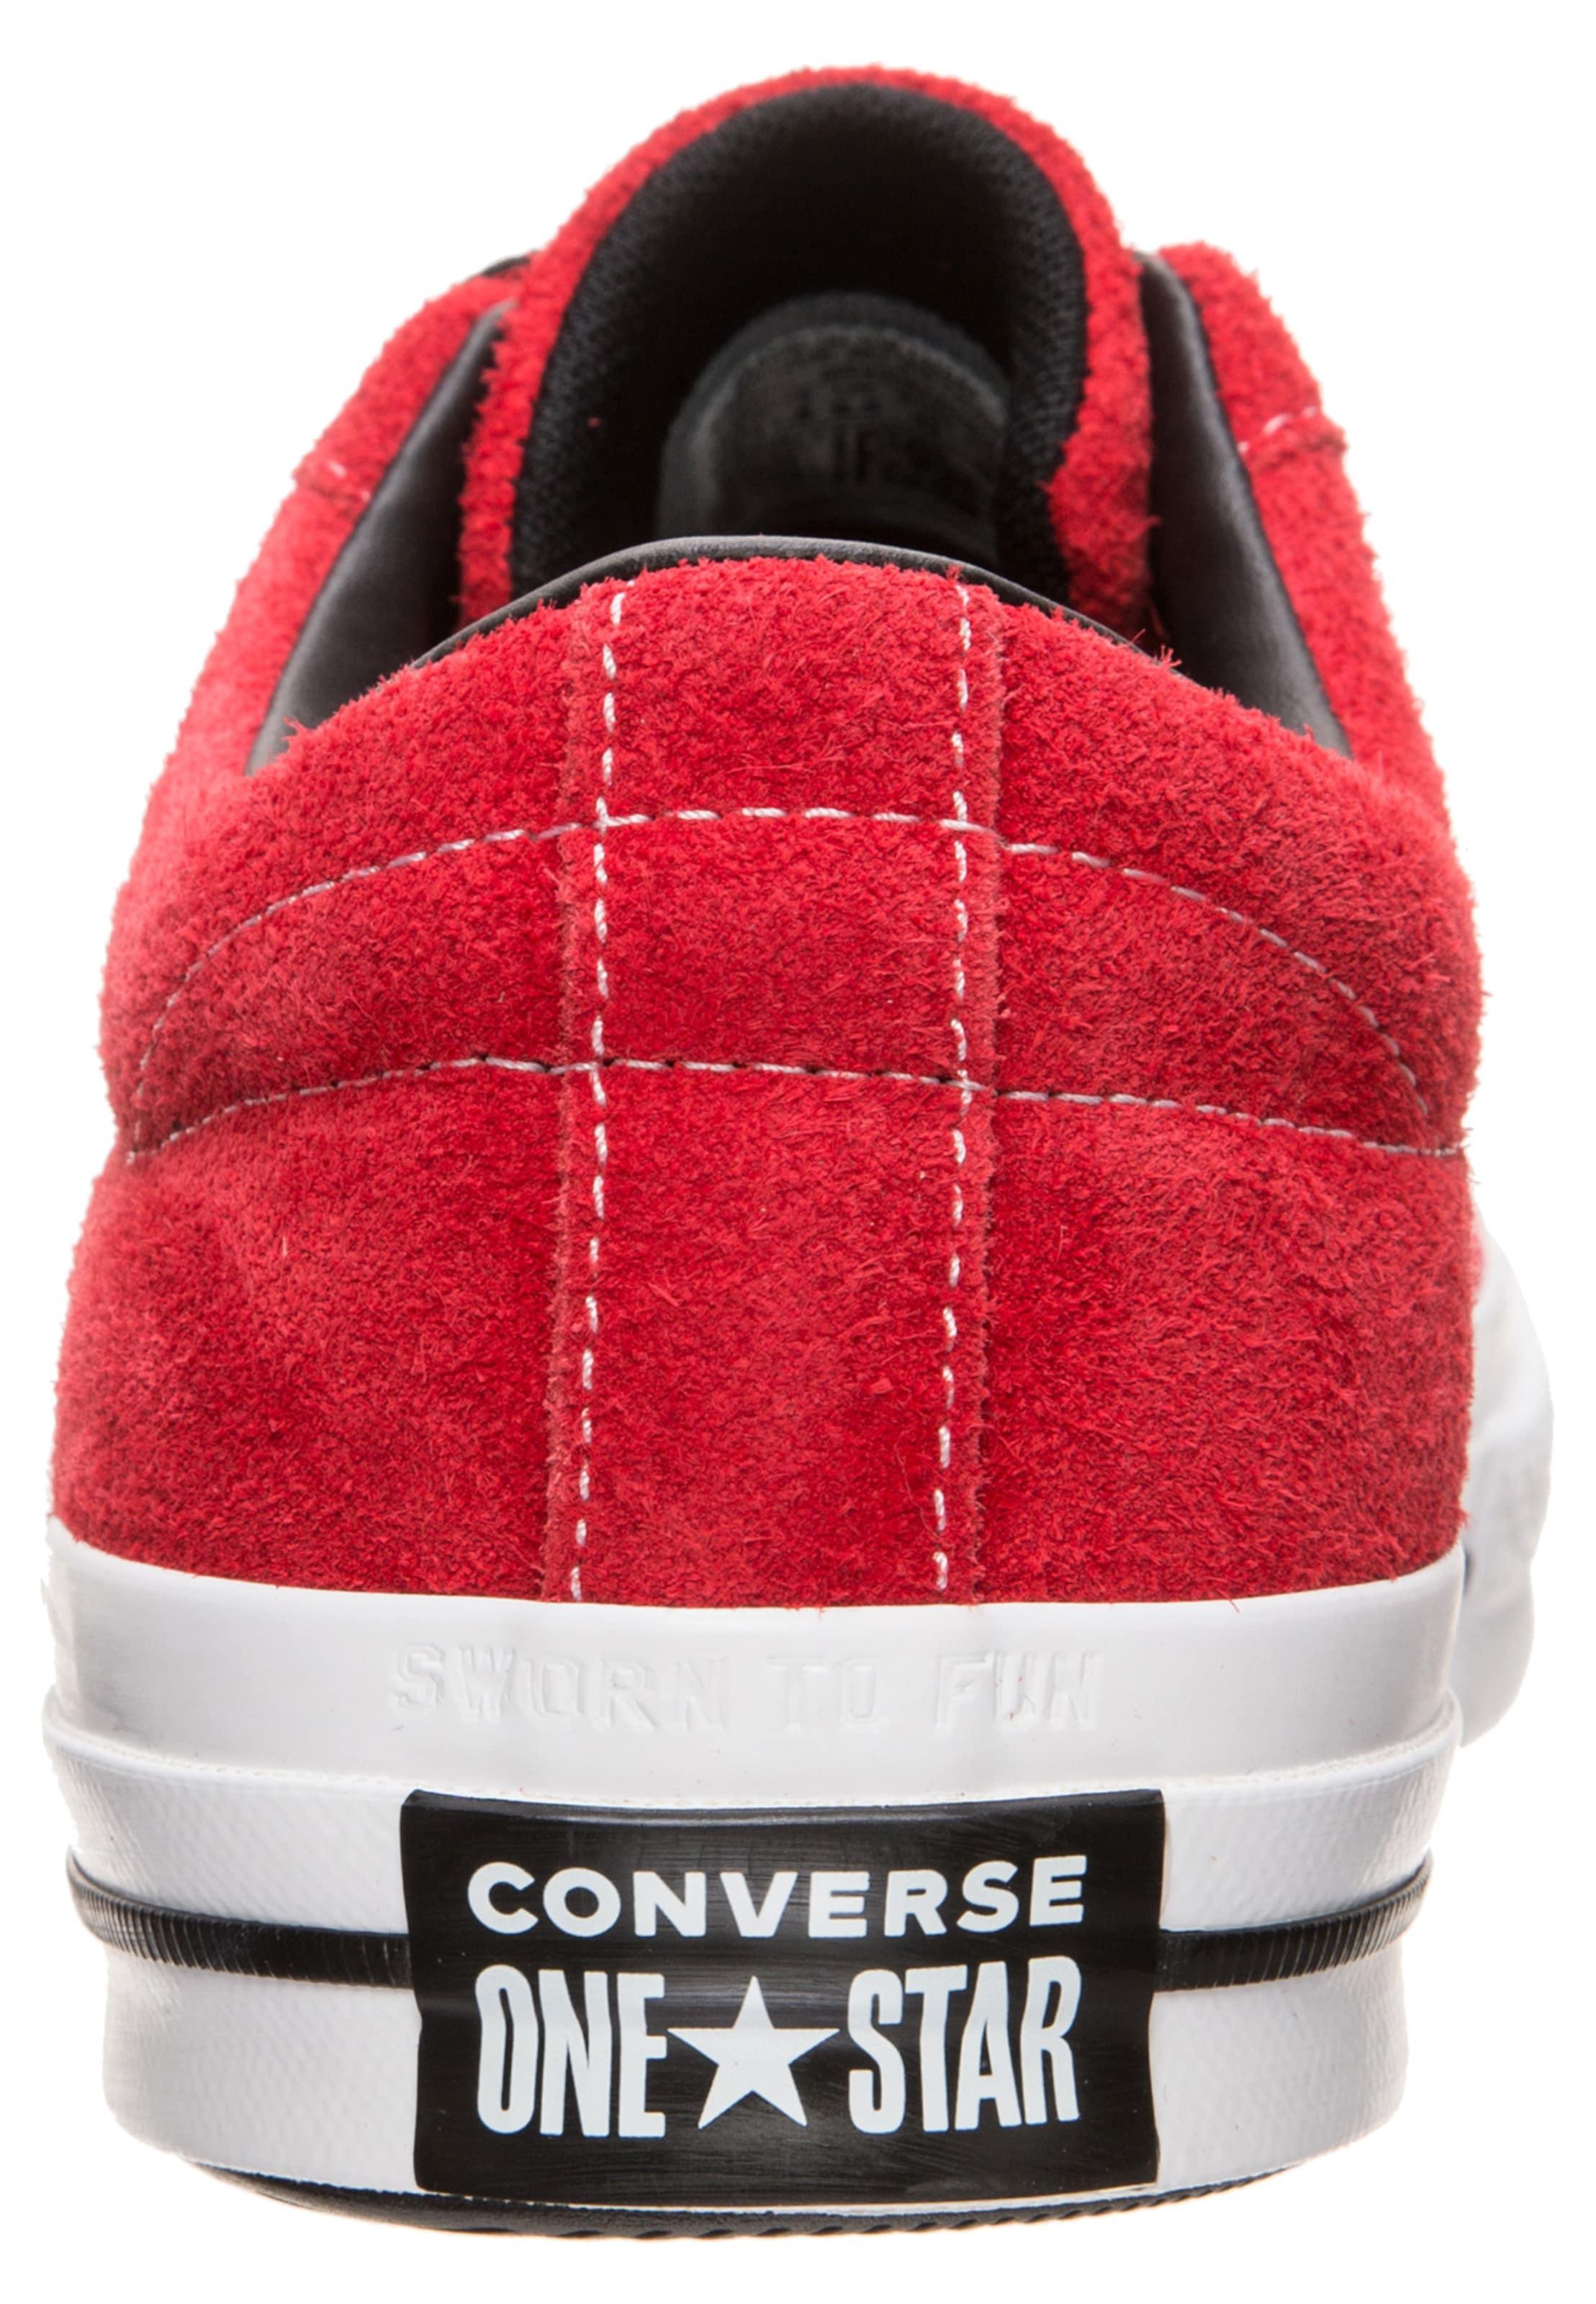 Converse Basses Baskets RougeNoir RougeNoir Converse Converse Basses En En Baskets bIvmY7gyf6